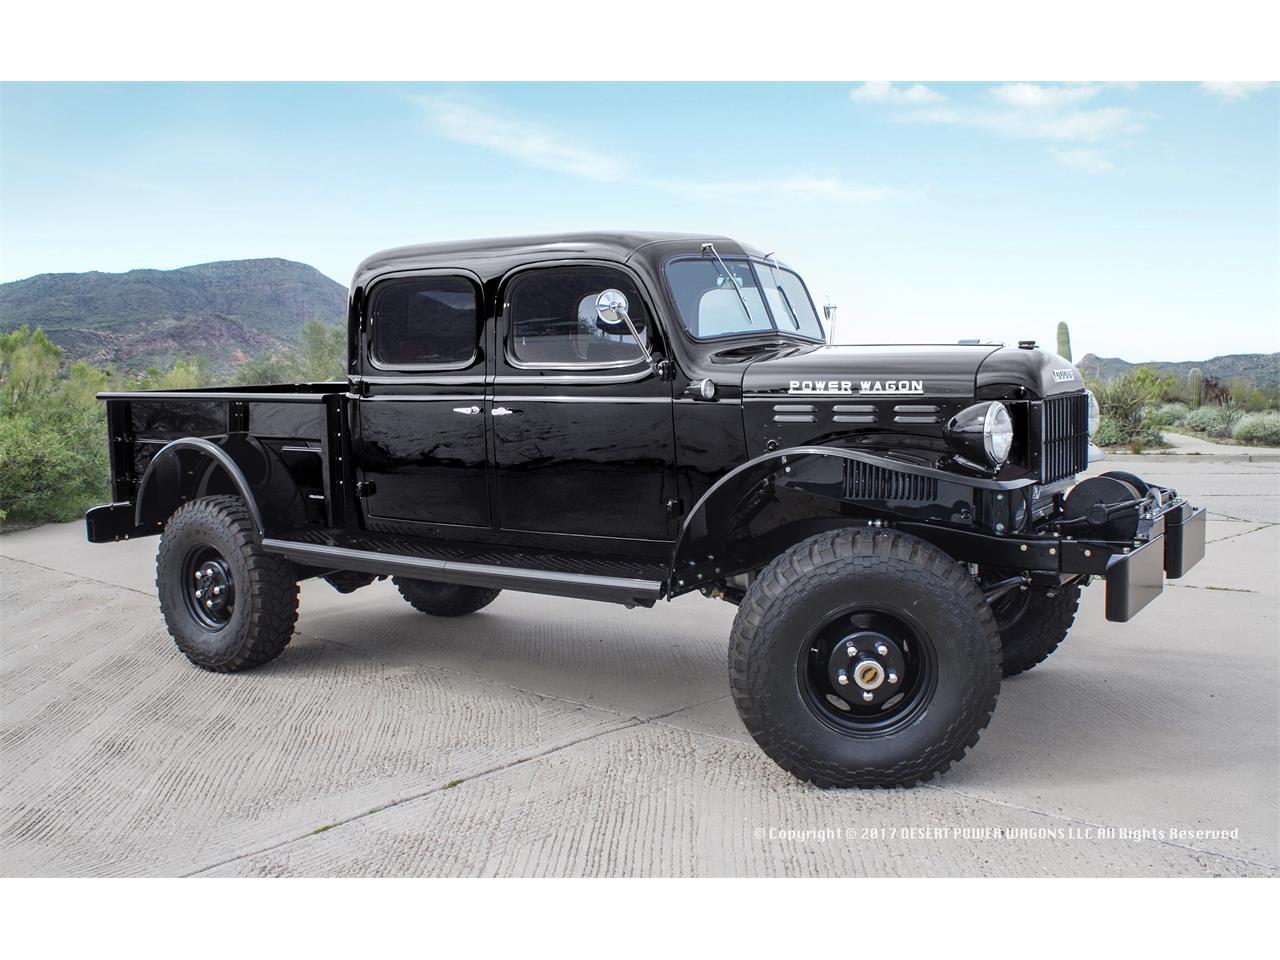 Dodge Power Wagon For Sale >> 1947 Dodge Power Wagon For Sale Classiccars Com Cc 1040831